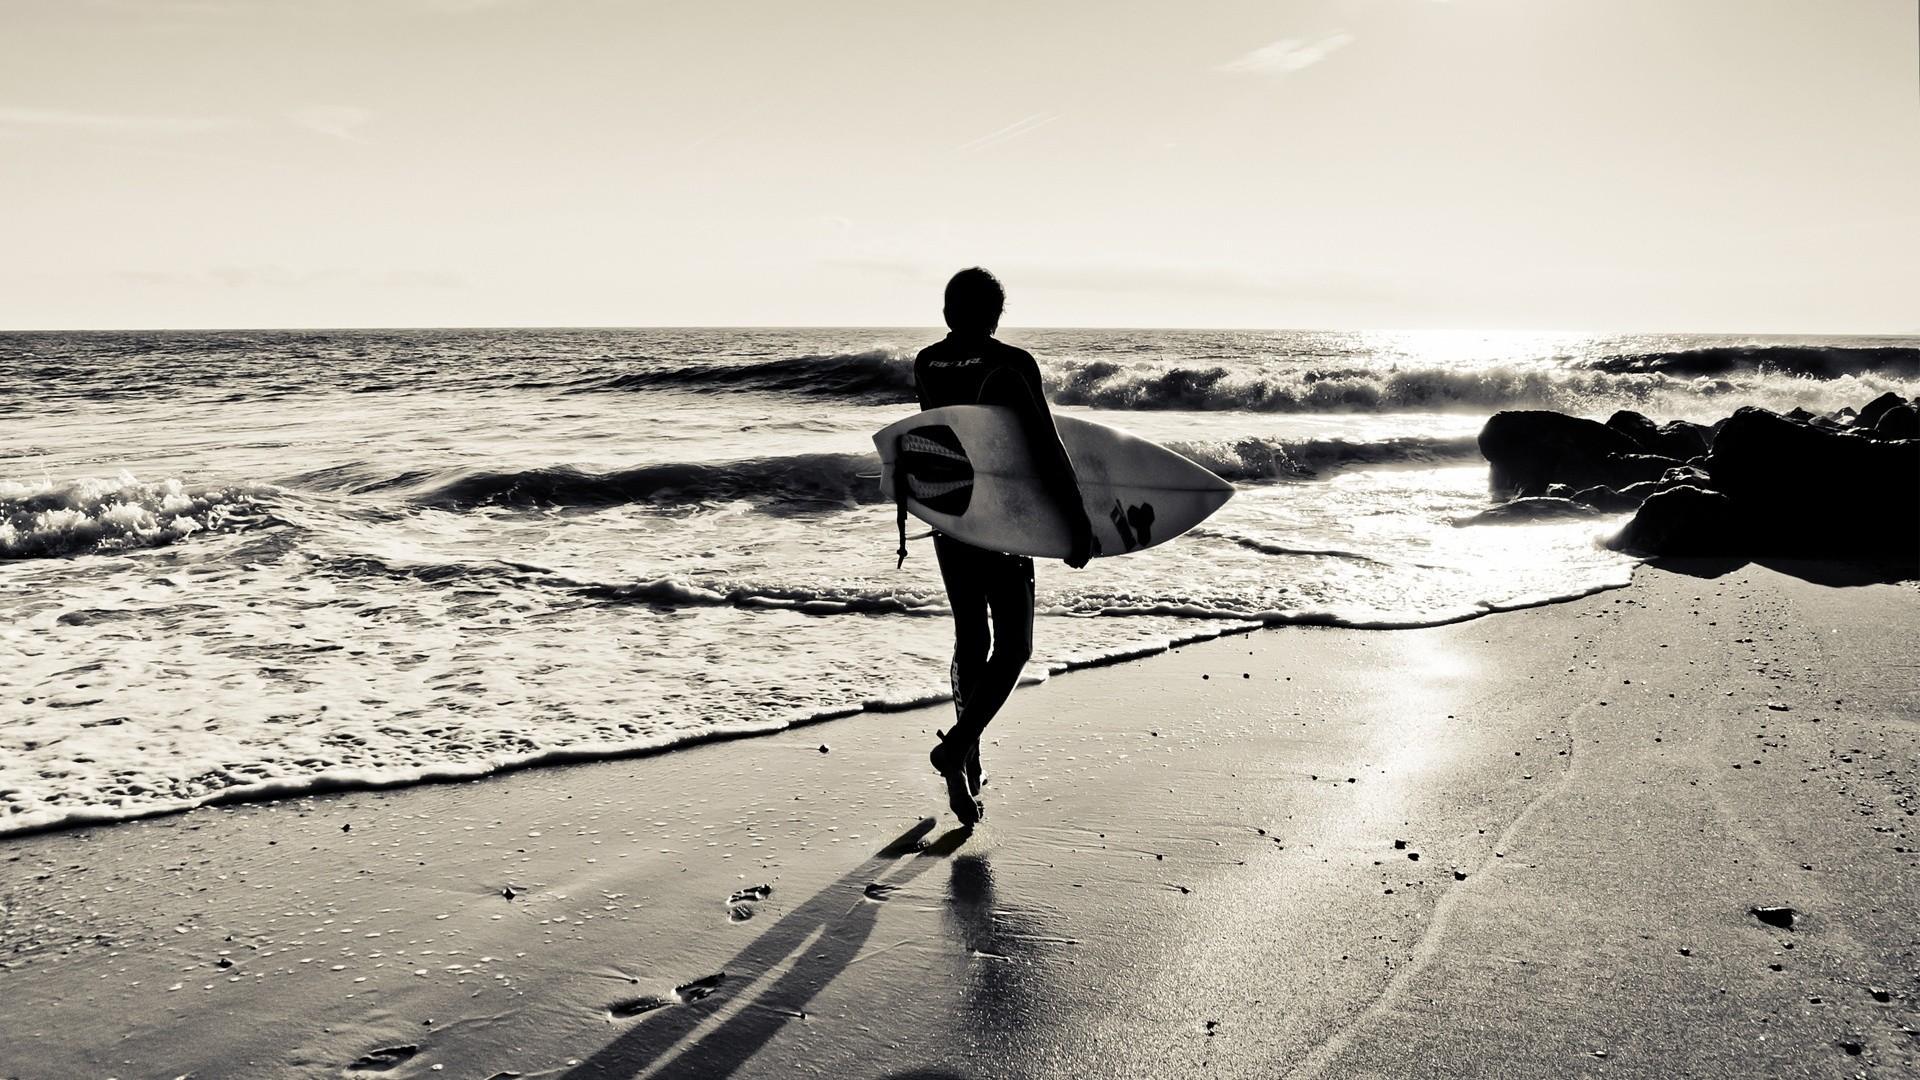 Wallpaper board, sand, surf, sea, surfing, sport